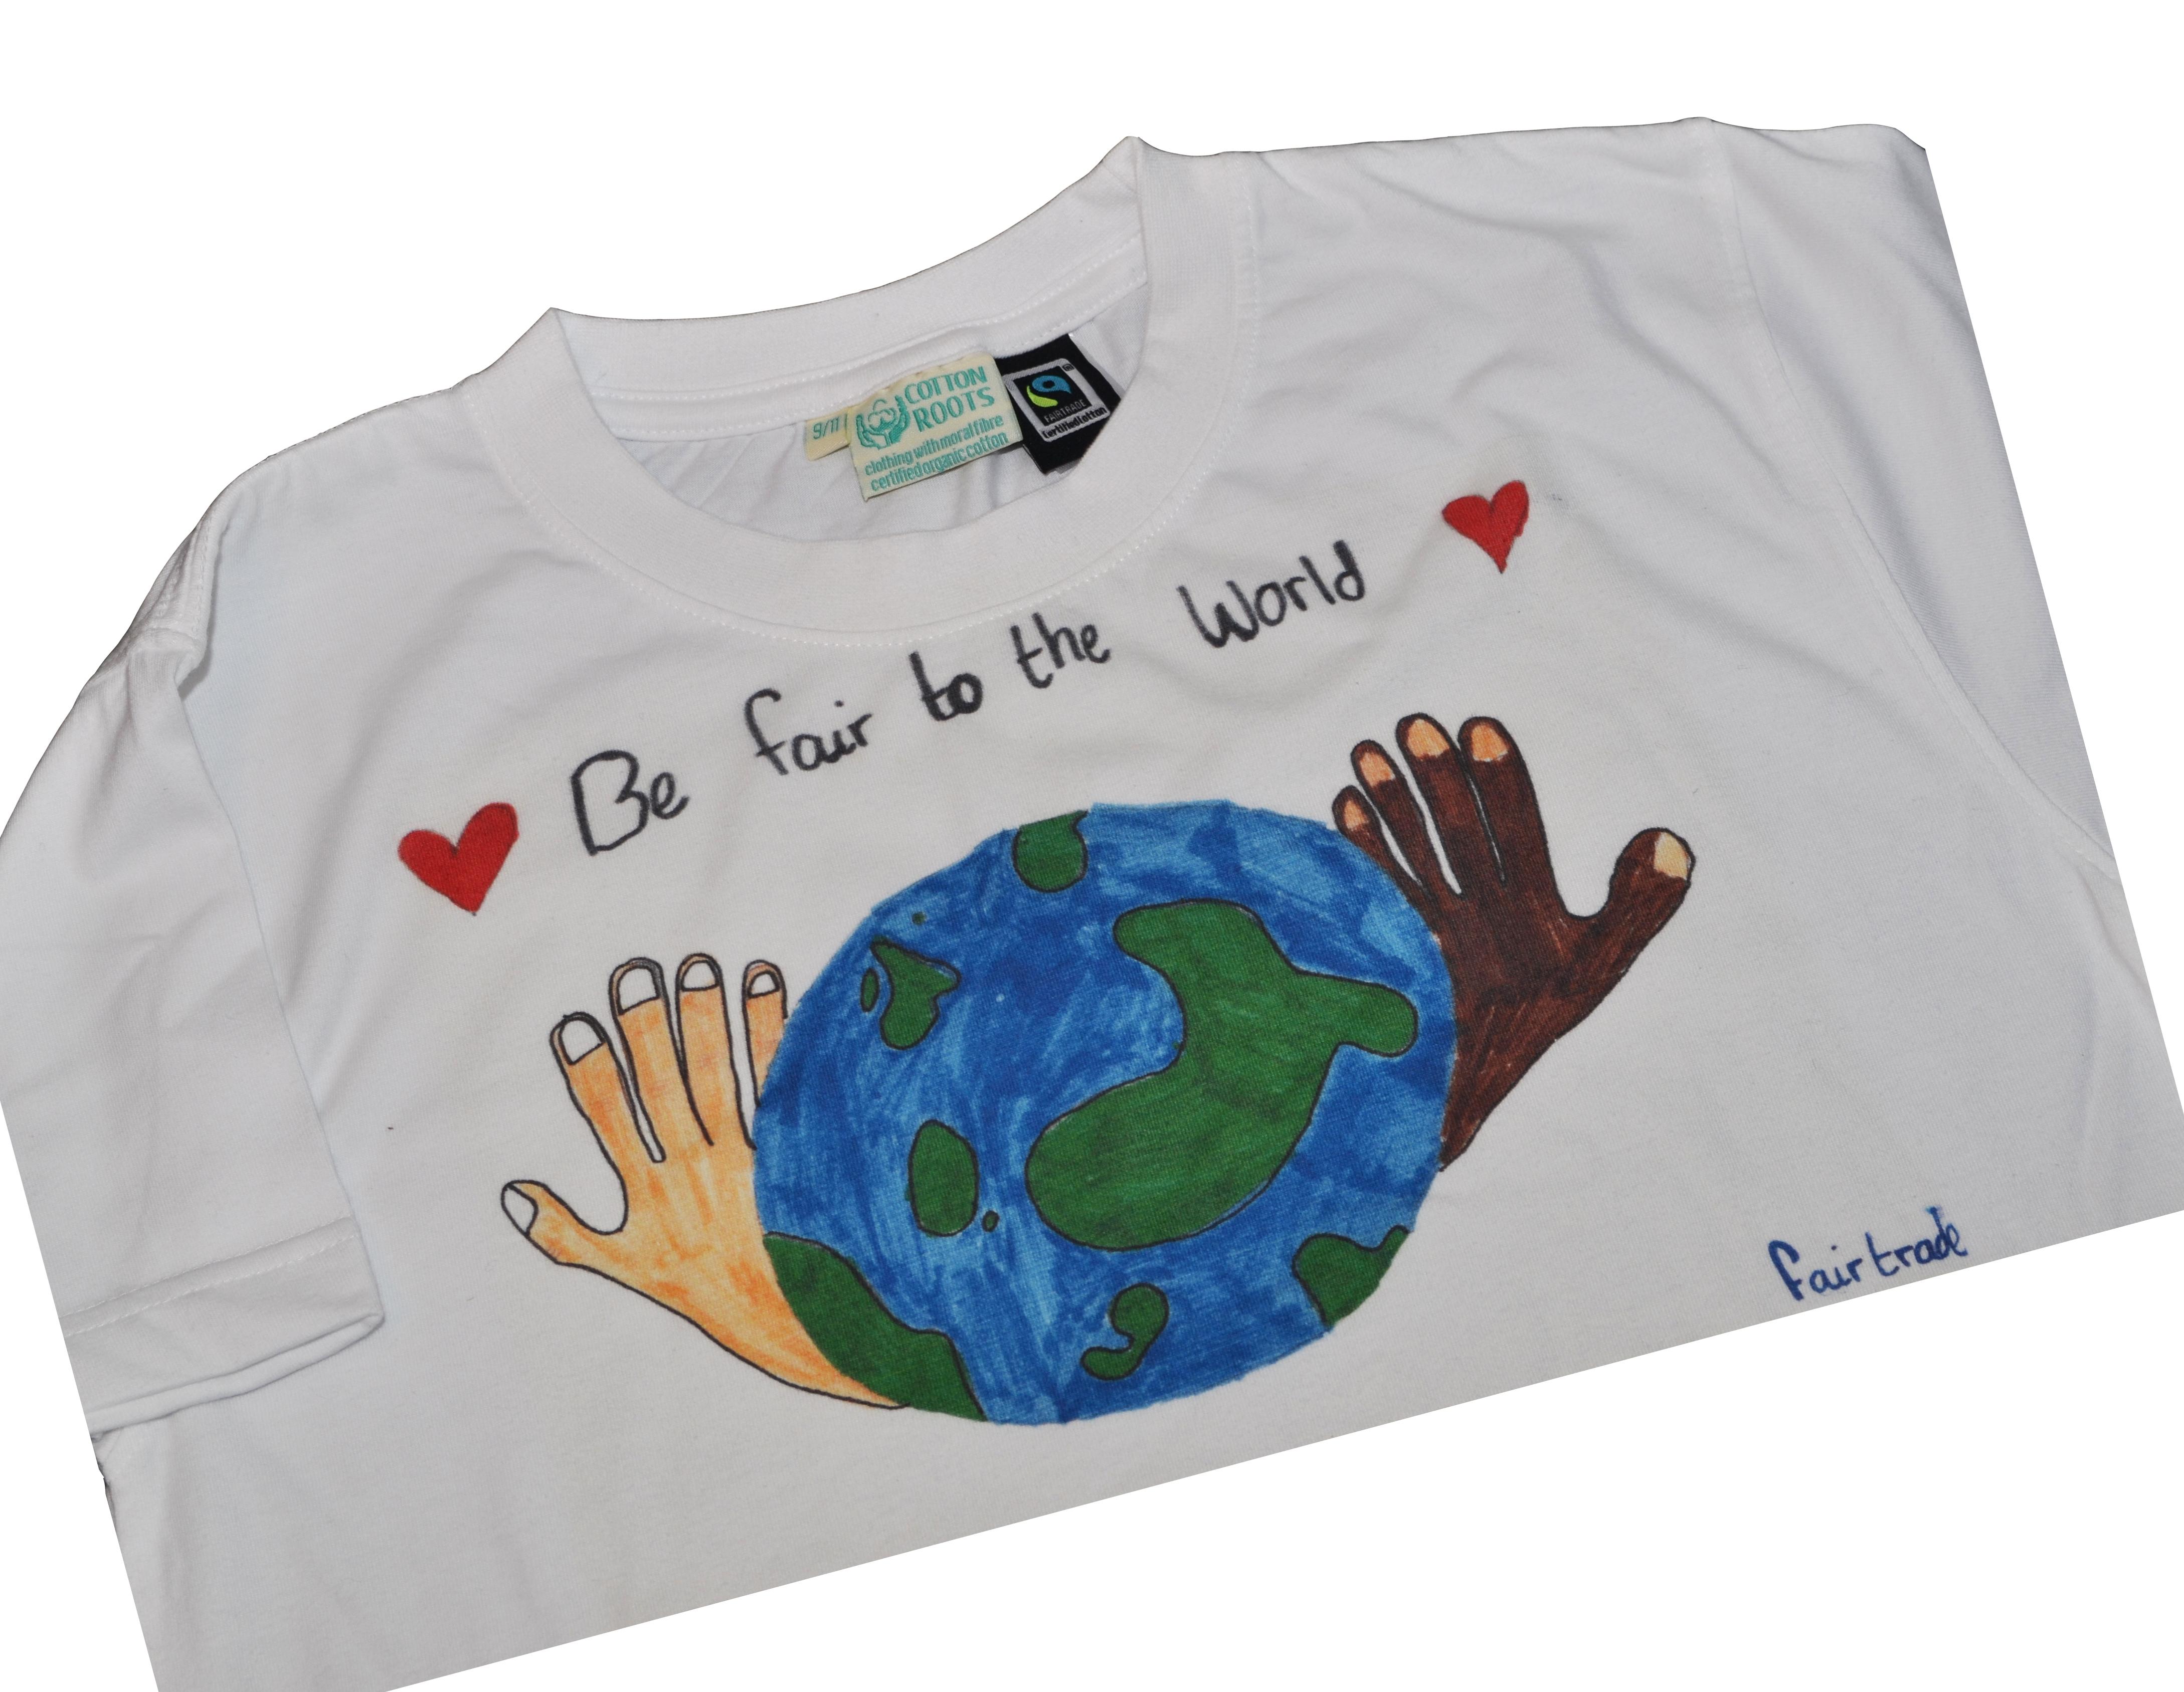 Shirt design resolution -  Resolution 4356 3375